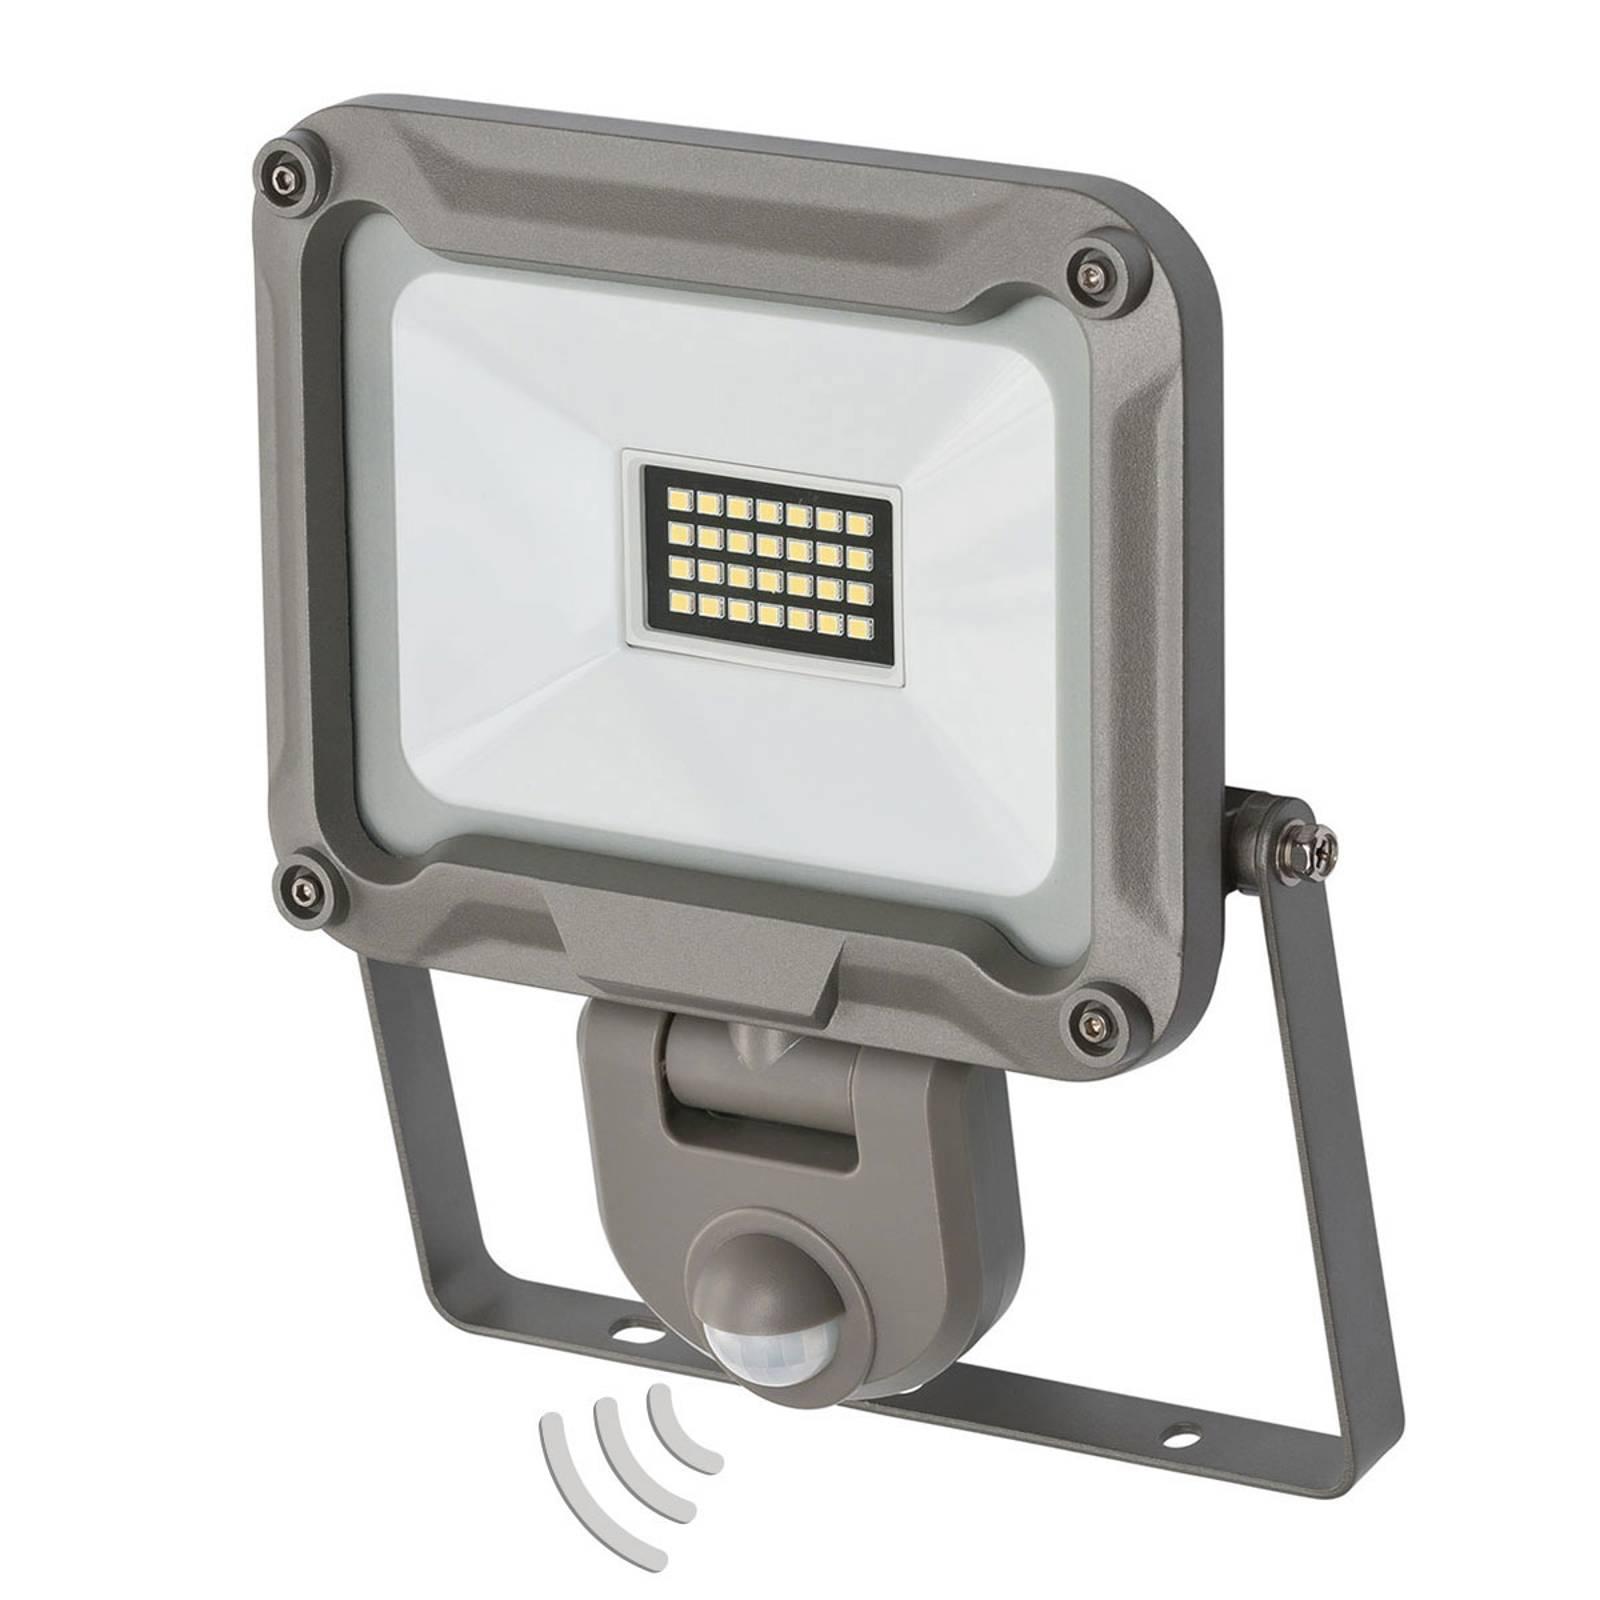 LED-ulkokohdevalaisin Jaro tunnistimella IP44 20W